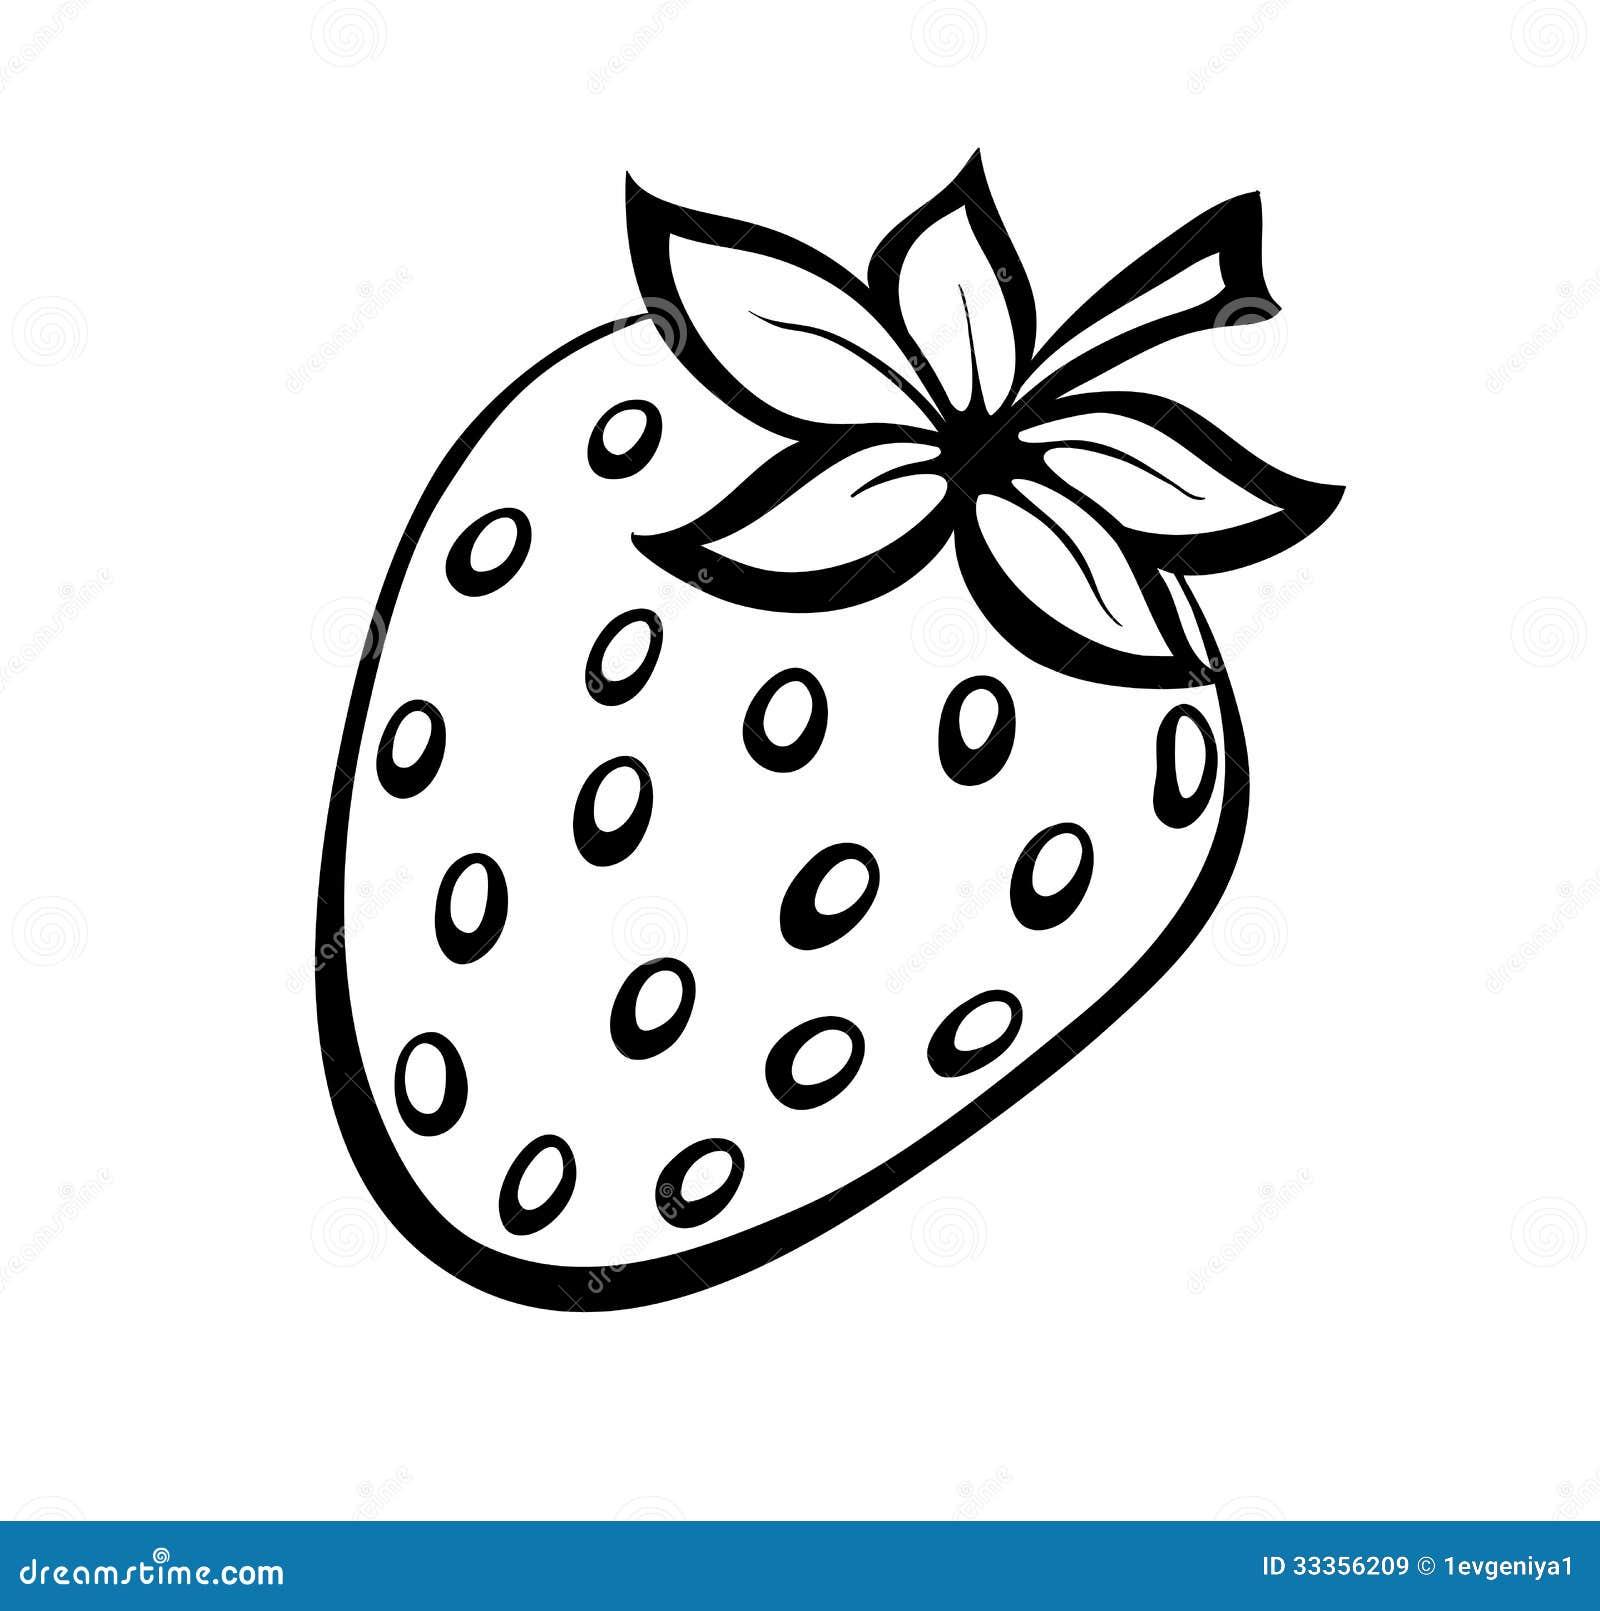 Vector Monochrome Illustration Of Strawberries Logo. Stock ...